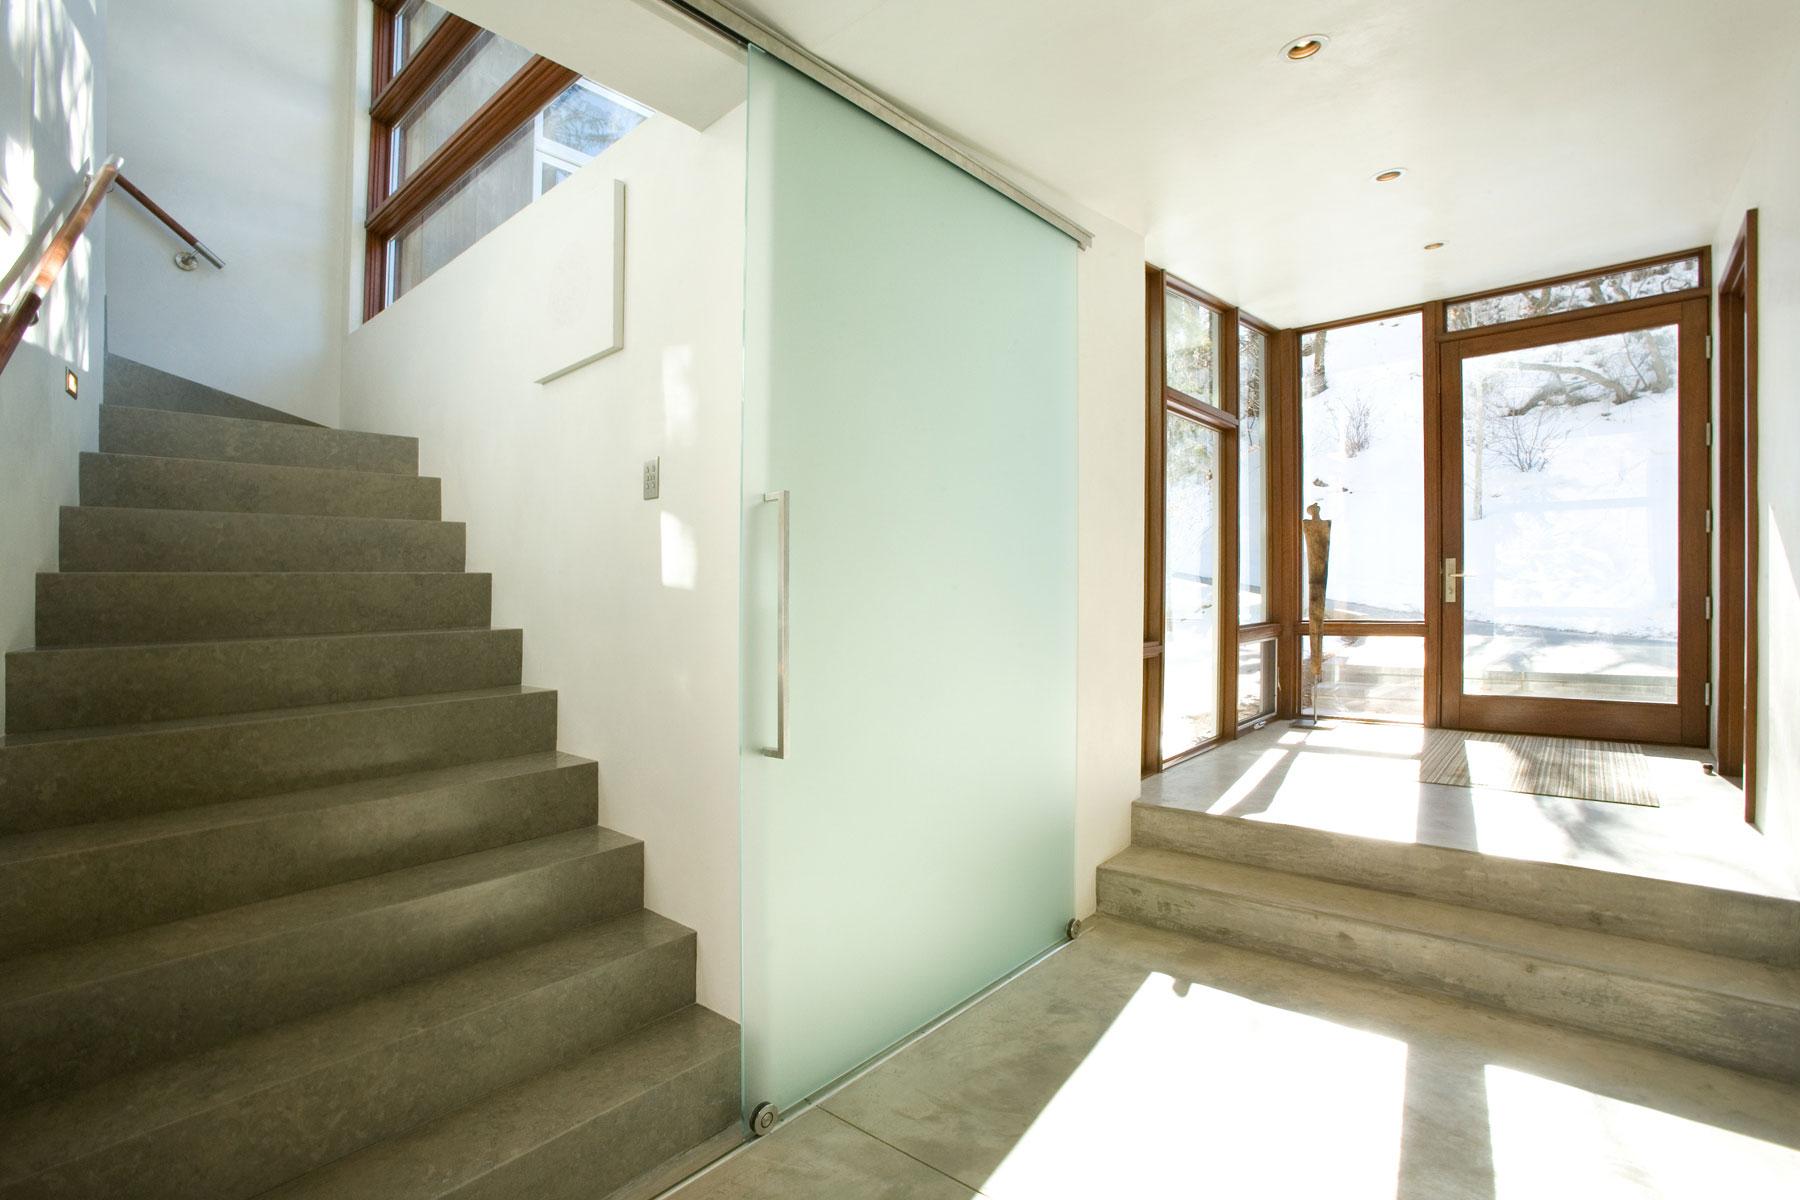 Интерьер резиденции Piampiano от Studio B Architects, Woody Creek, Колорадо, США